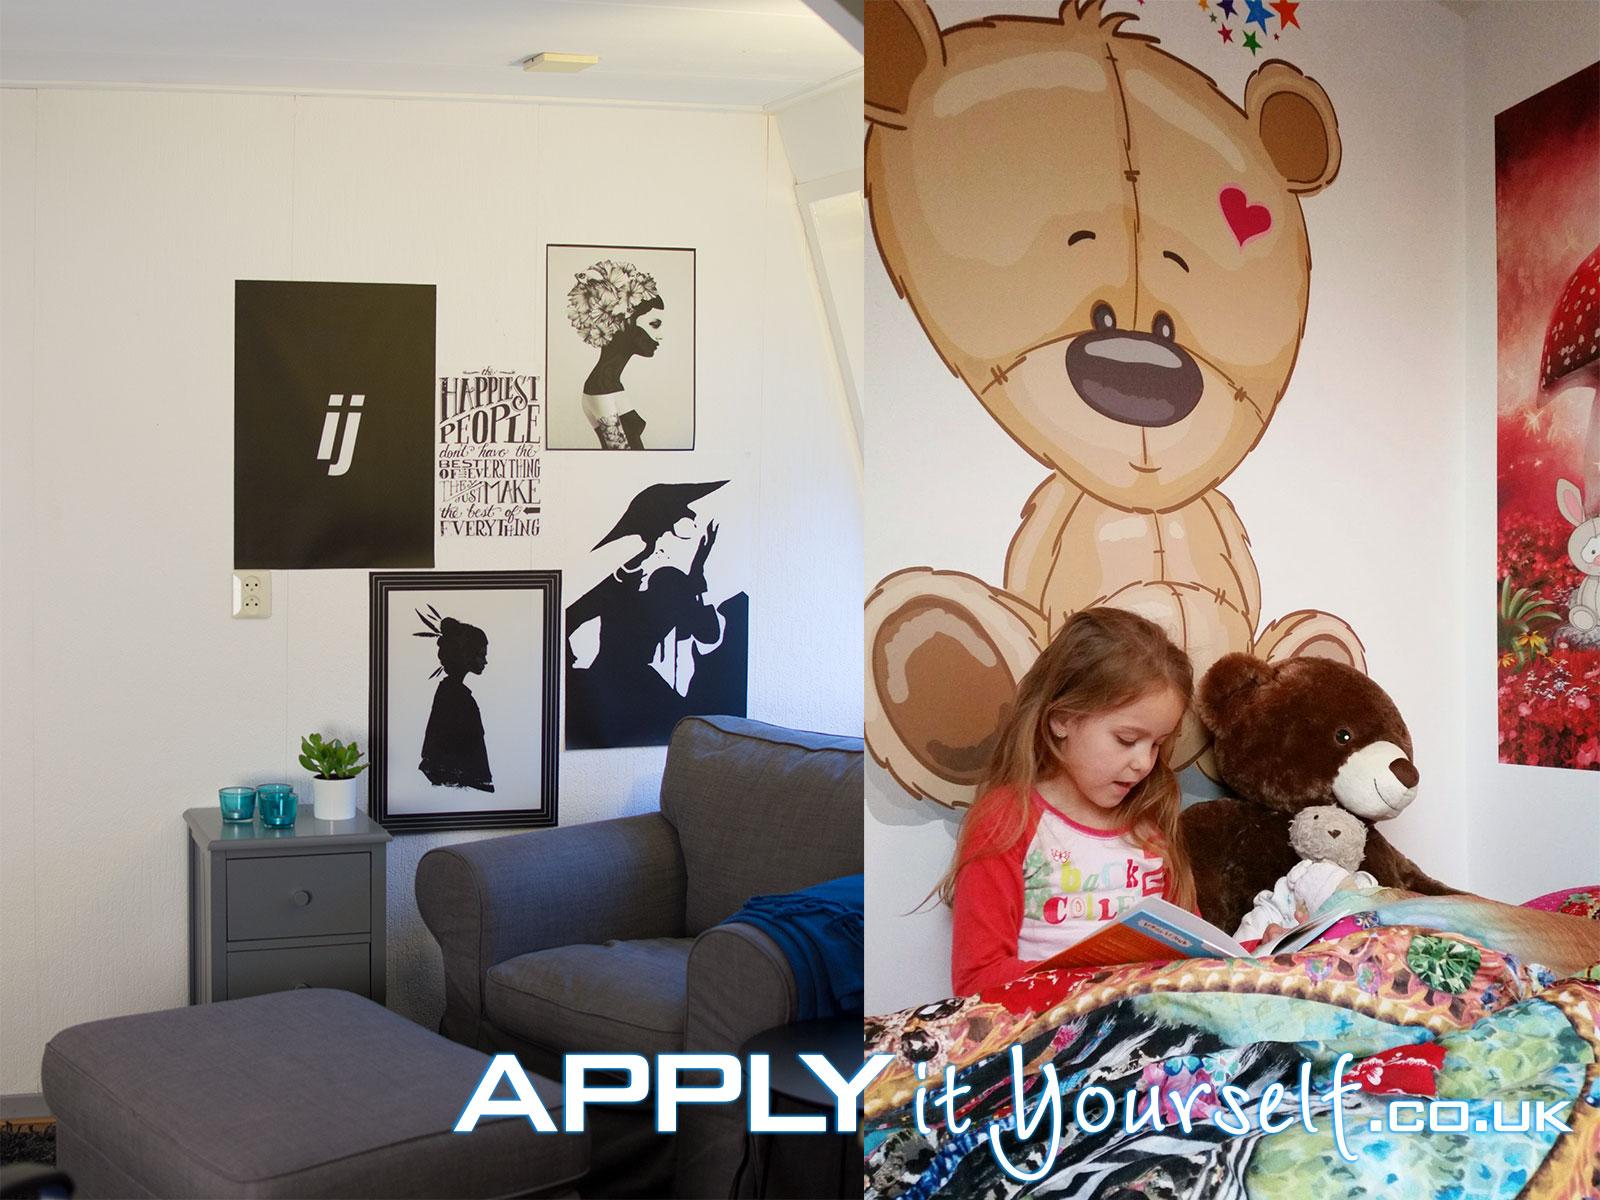 wall mural, textile prints, cut-to-shape